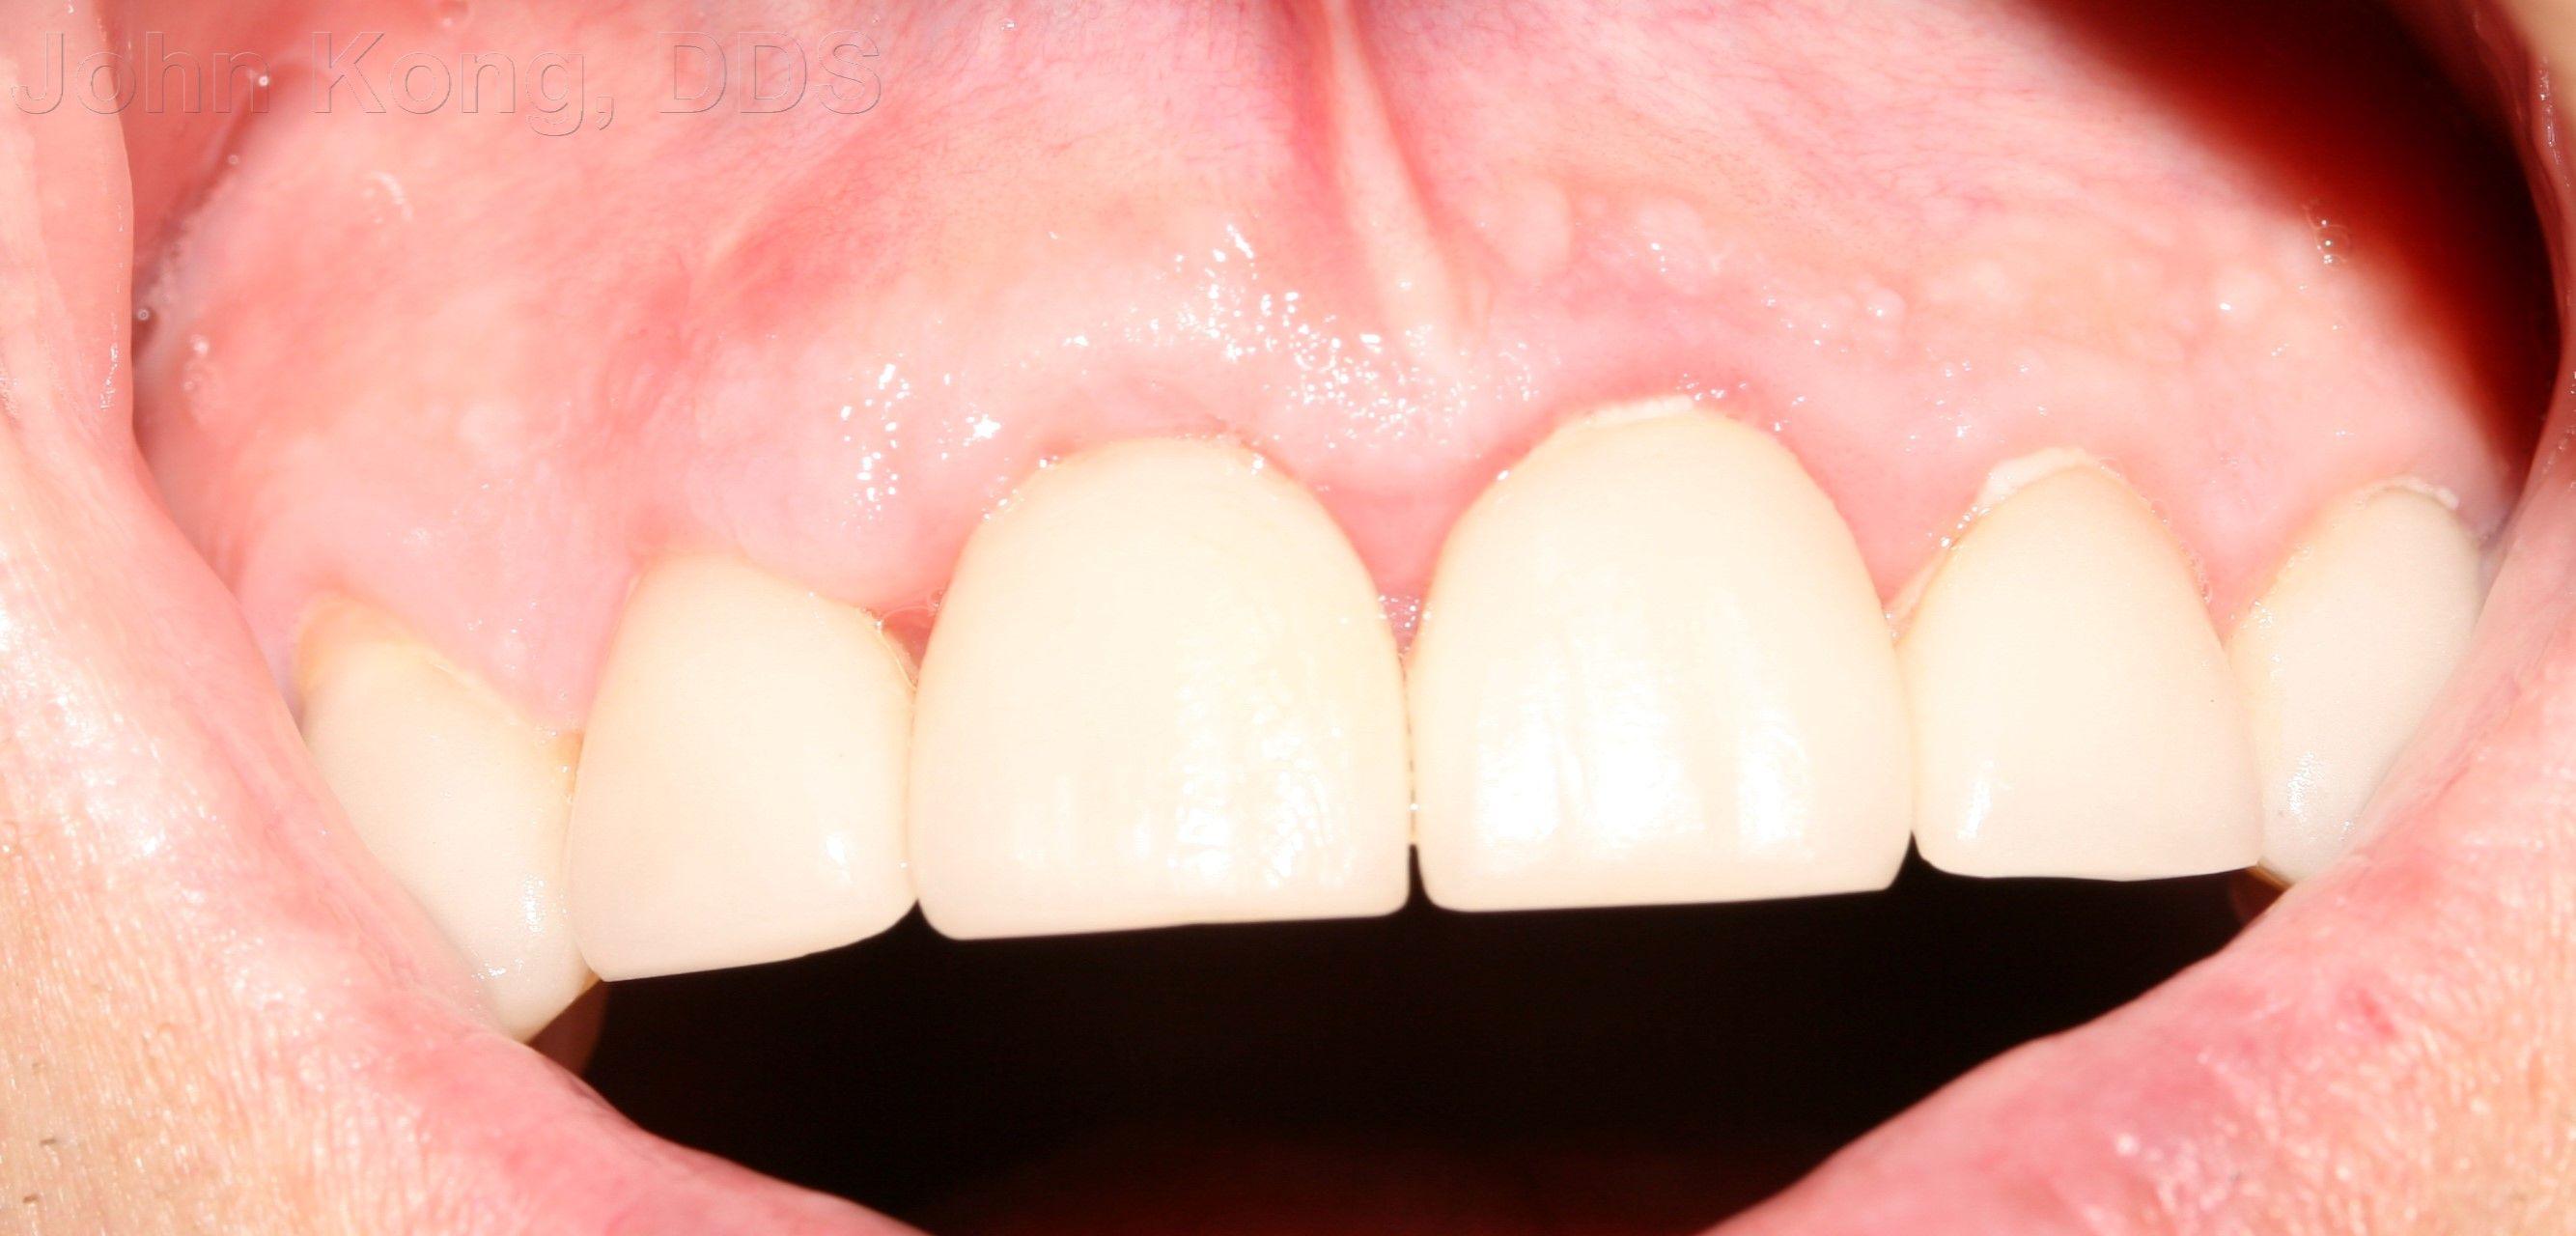 Root Coverage 8 Gum Grafts Dental implants, Gum graft